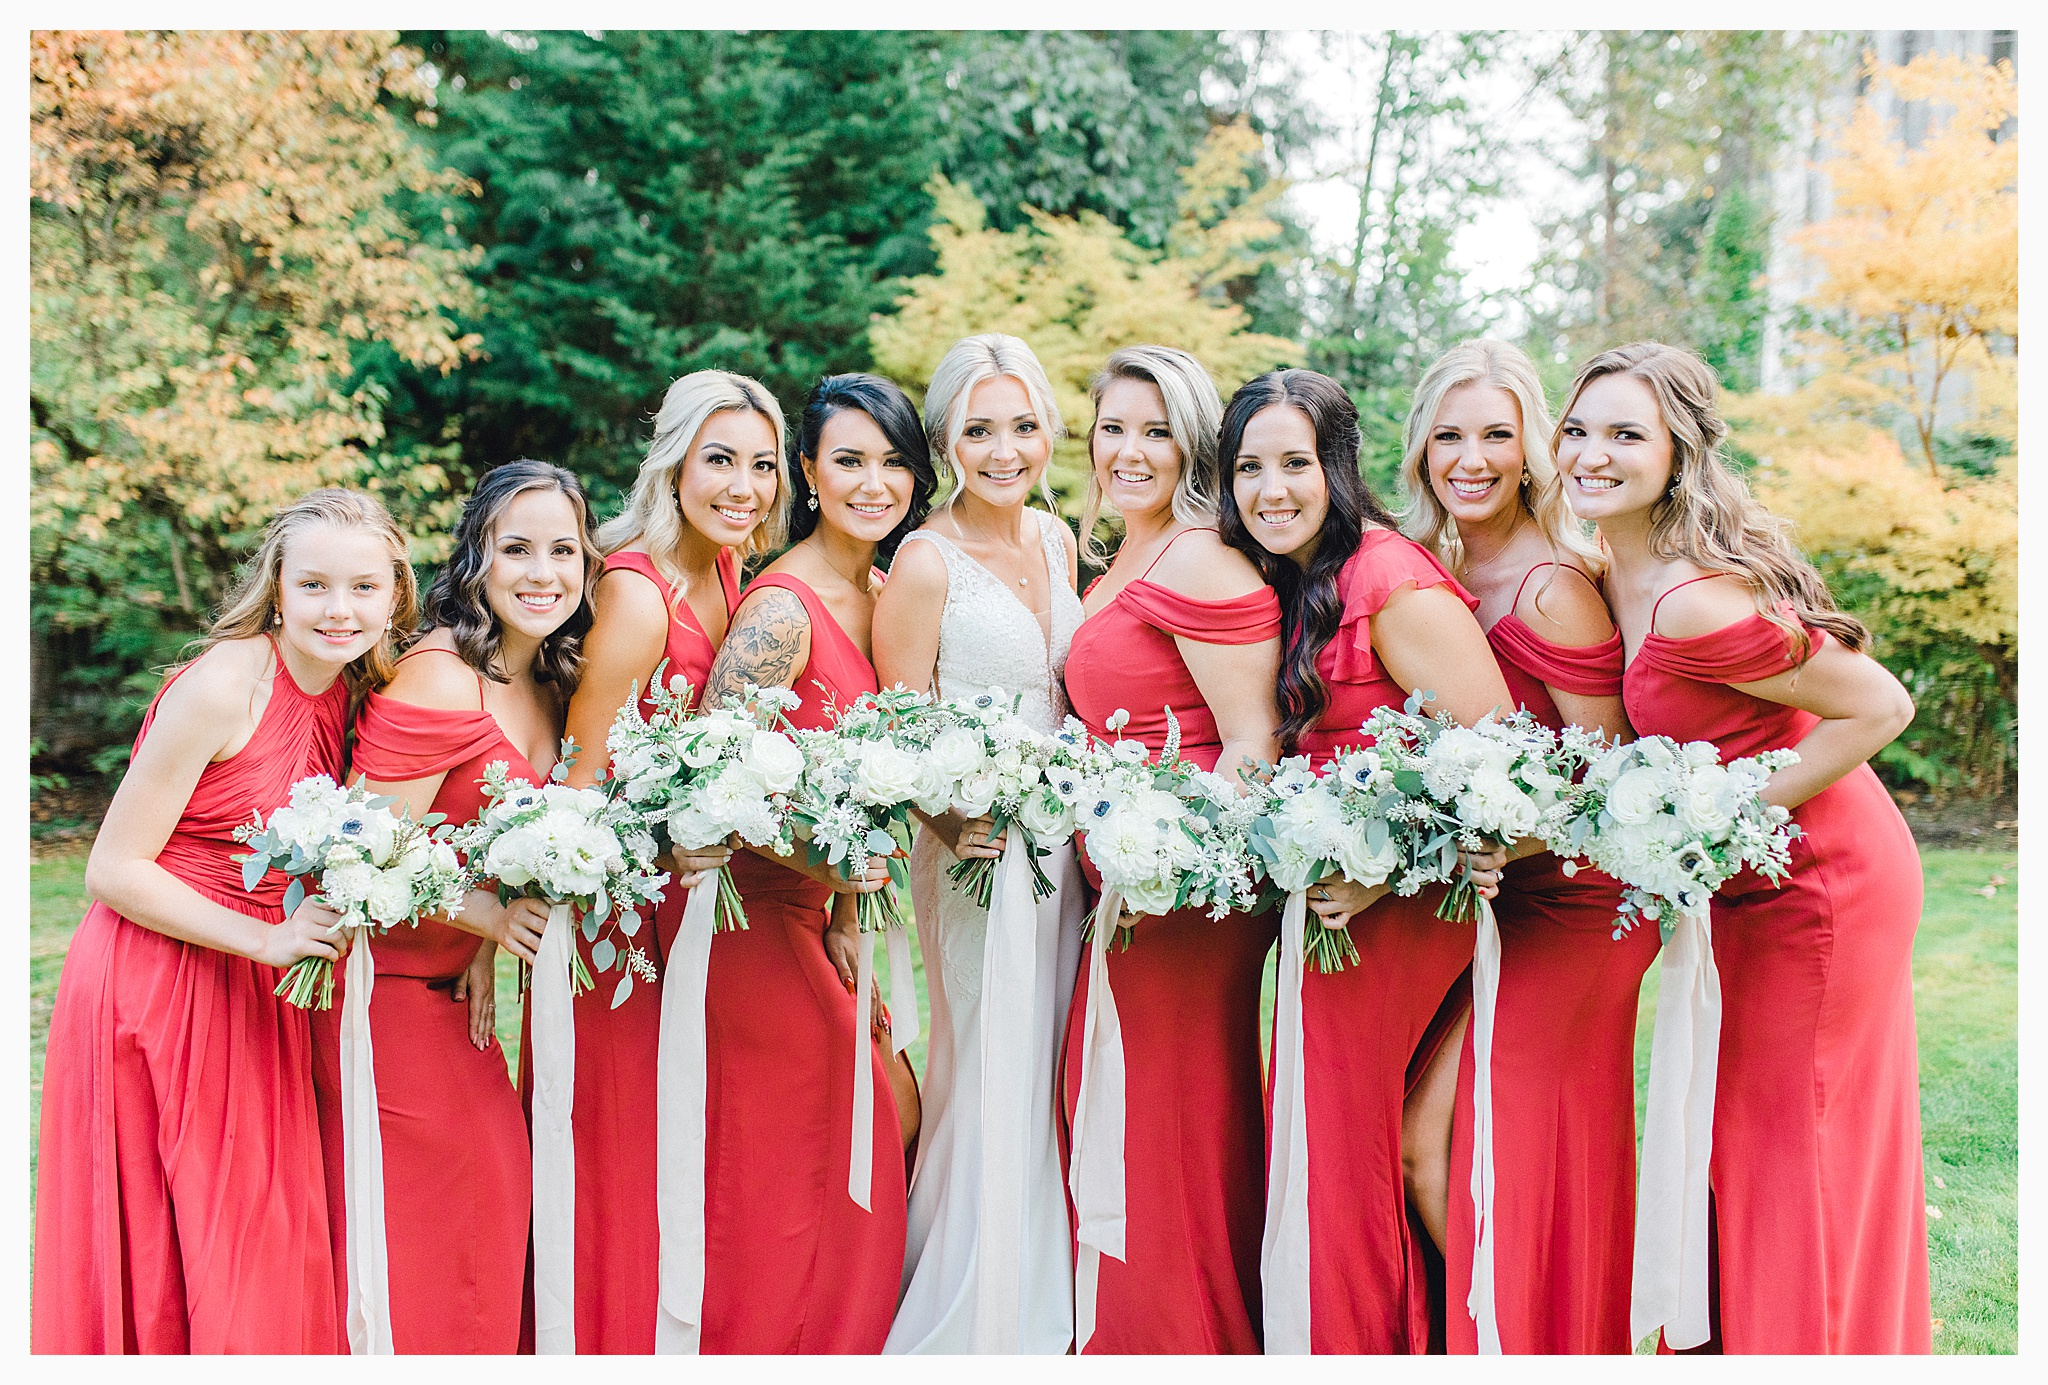 Emma Rose Company Light and Airy Wedding Photographer, Beautiful fall wedding at Rock Creek Gardens Venue in Puyallup, Washington._0056.jpg